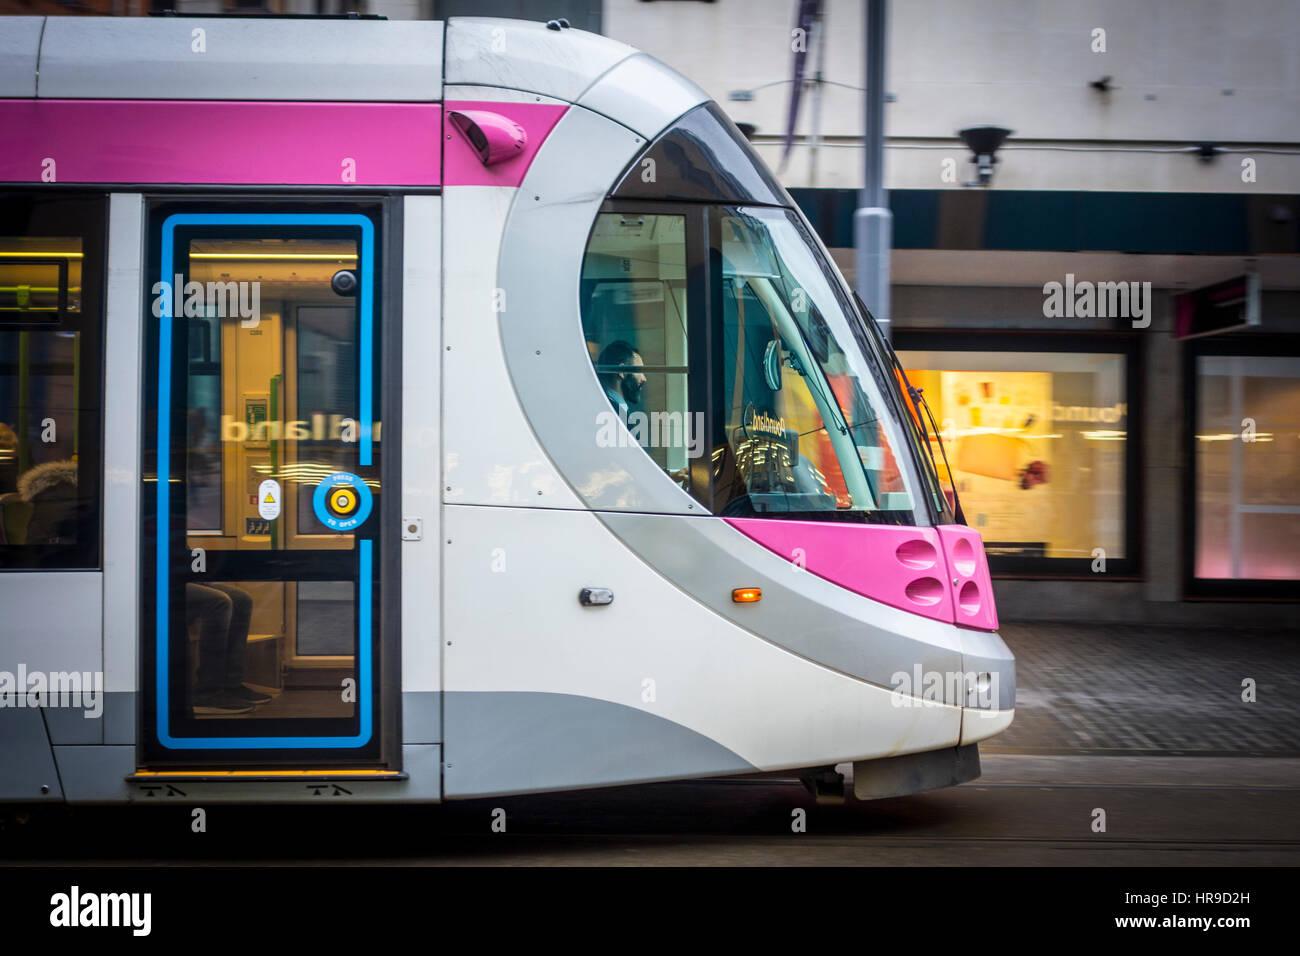 Birmingham Tram, Corporation Street Birmingham, UK - Stock Image